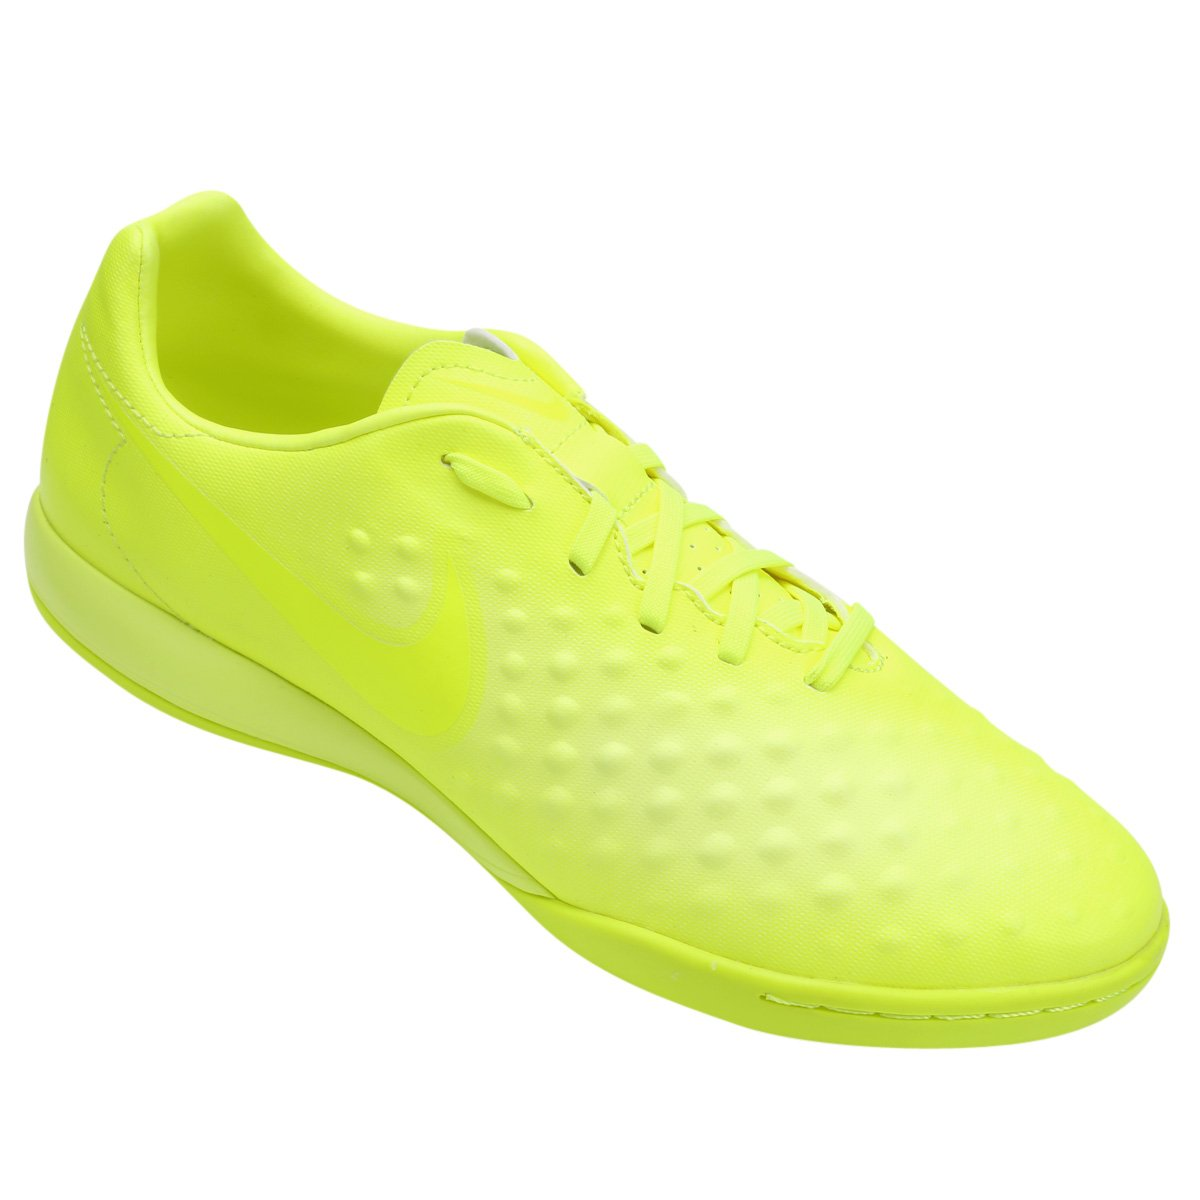 Chuteira Futsal Nike Magista Onda II IC - Verde Limão - Compre Agora ... 0452a0a94b8c0